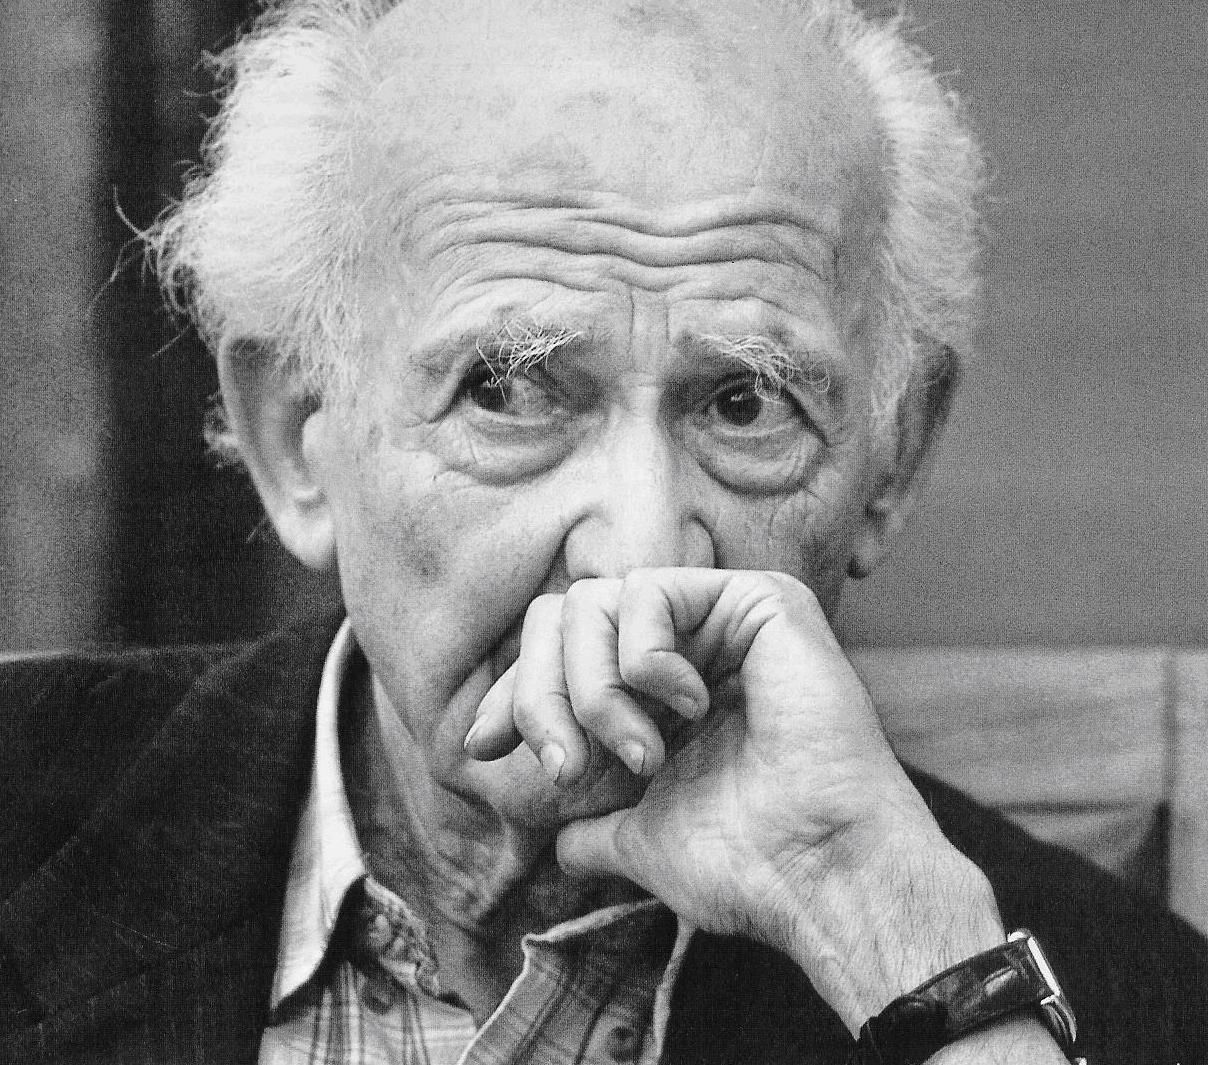 Zygmunt Bauman Pondering The Damnation Of Humanity Worlds Of